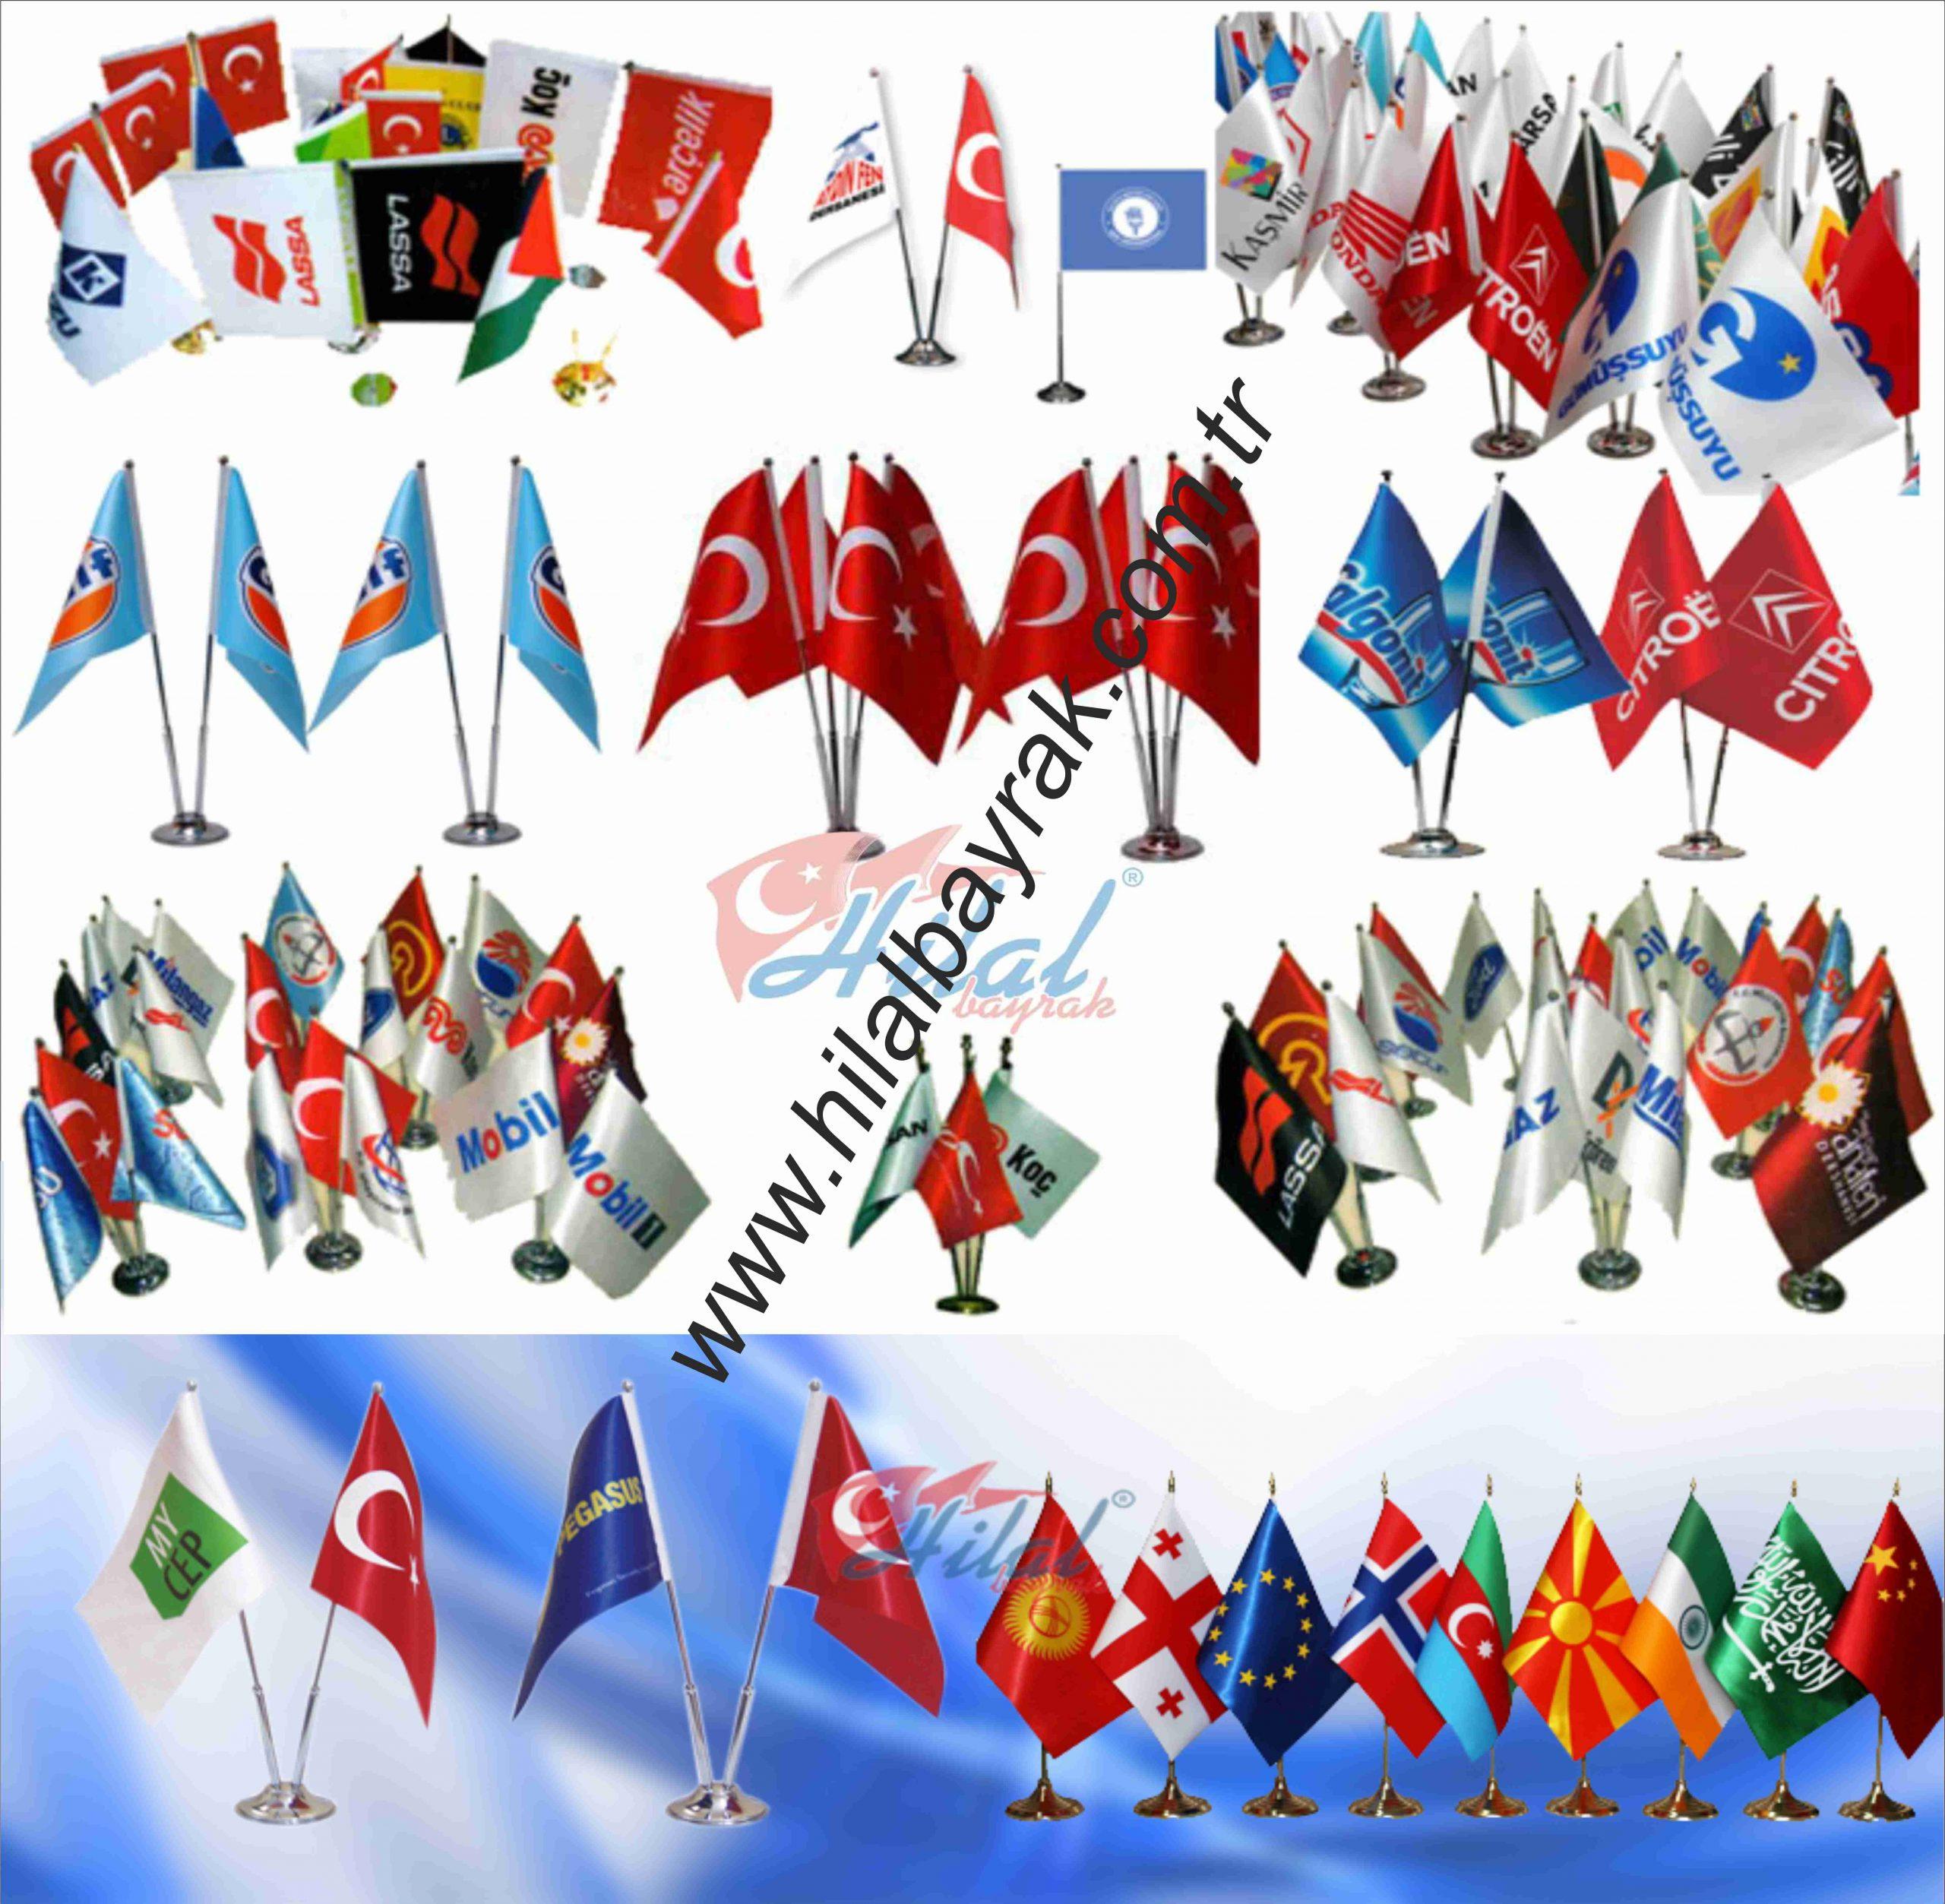 Masa Bayrak satışı, Kadıköy İstanbul, masa bayrak, satışı, masa bayrak Ümraniye, masa bayrak imalatı, acil masa bayrağı, masa bayrakları, masa bayrak satışı 7.24 SAAT AÇIK HİZMET Masa Bayrak satışı, Kadıköy İstanbul, masa bayrak, satışı, masa bayrak Ümraniye, masa bayrak imalatı, acil masa bayrağı, masa bayrakları, masa bayrak burada satışı 7.24 SAAT AÇIK HİZMET Masa Bayrak Üretimi, Kadıköy İstanbul, masa bayrak, satış, masa bayrak Ümraniye, masa bayrak imalatı, acil masa bayrağı, masa bayrakları, masa bayrak burada satışı 7.24 SAAT AÇIK HİZMET Masa Flama Bayrak İstanbul, masa bayrak, satışı, masa bayrak Ümraniye, masa bayrak imalatı, acil masa bayrağı, masa bayrakları, masa bayrak burada satışı ACİL 7.24 SAAT AÇIK HİZMET